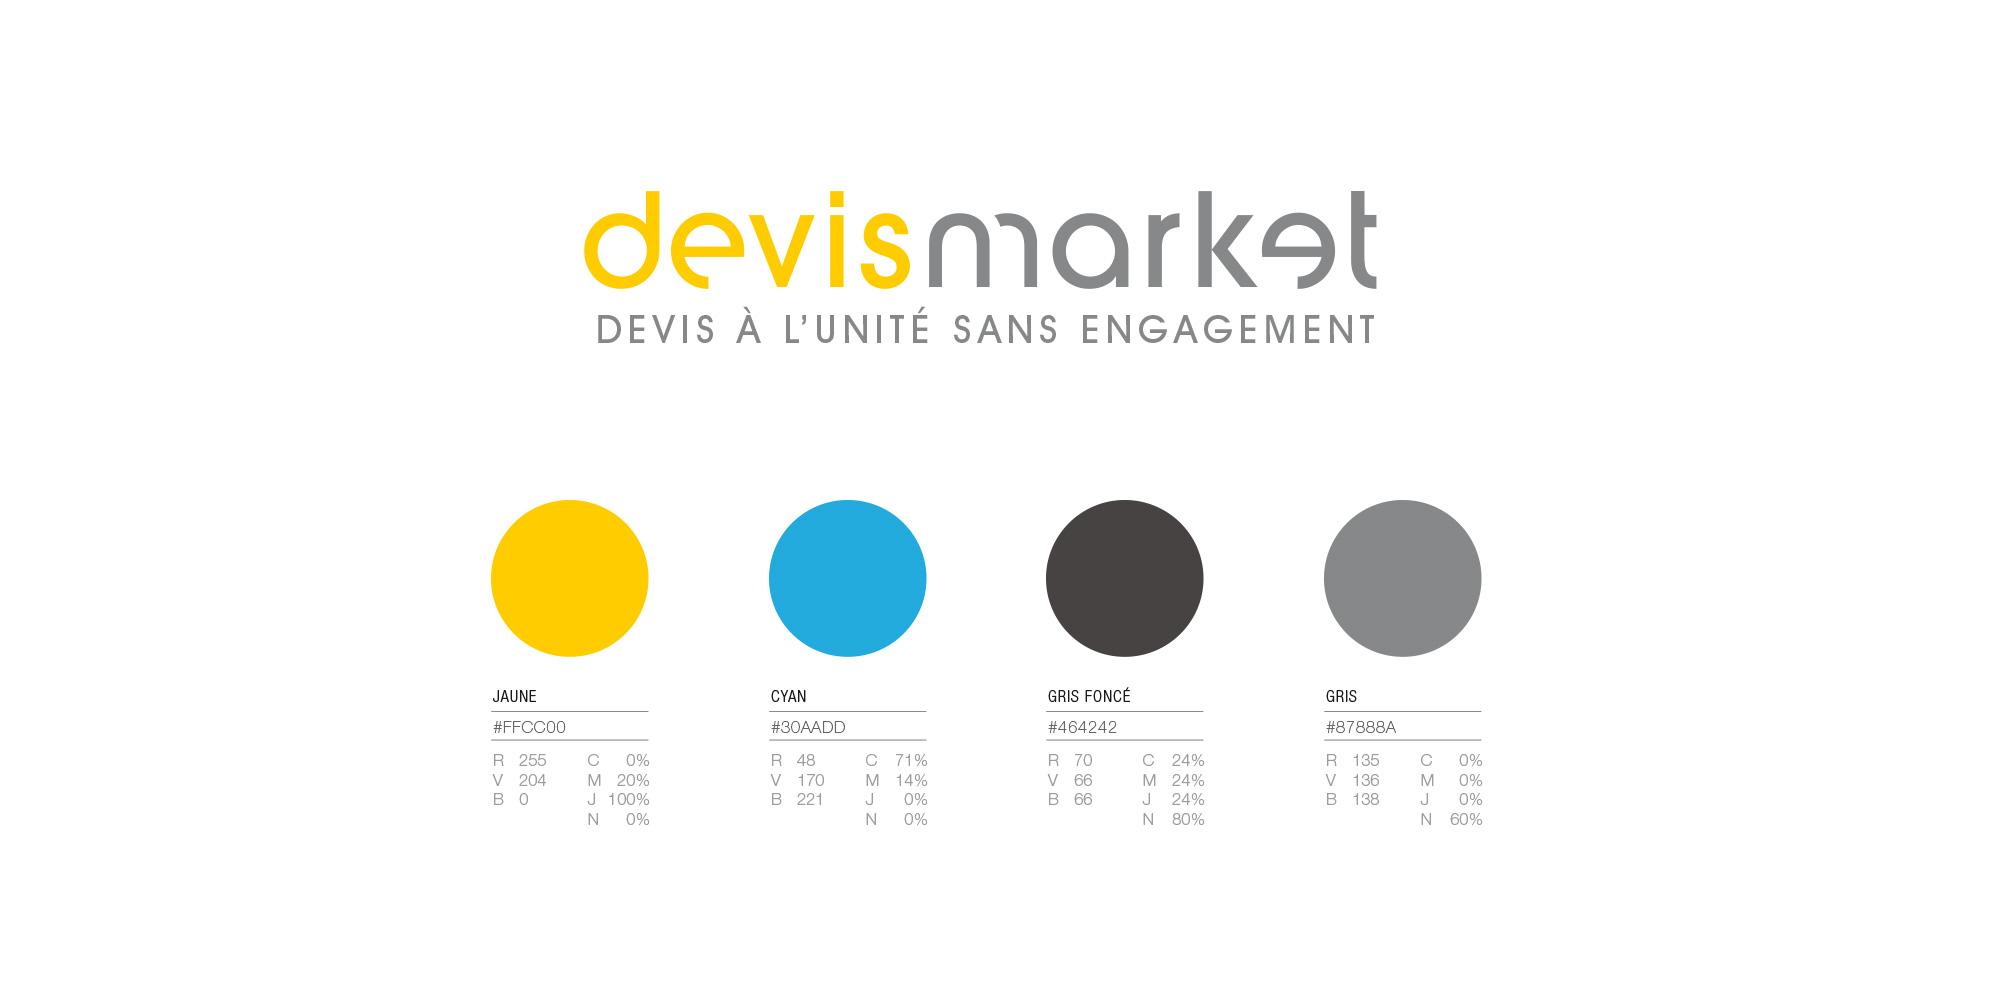 devis_market_2